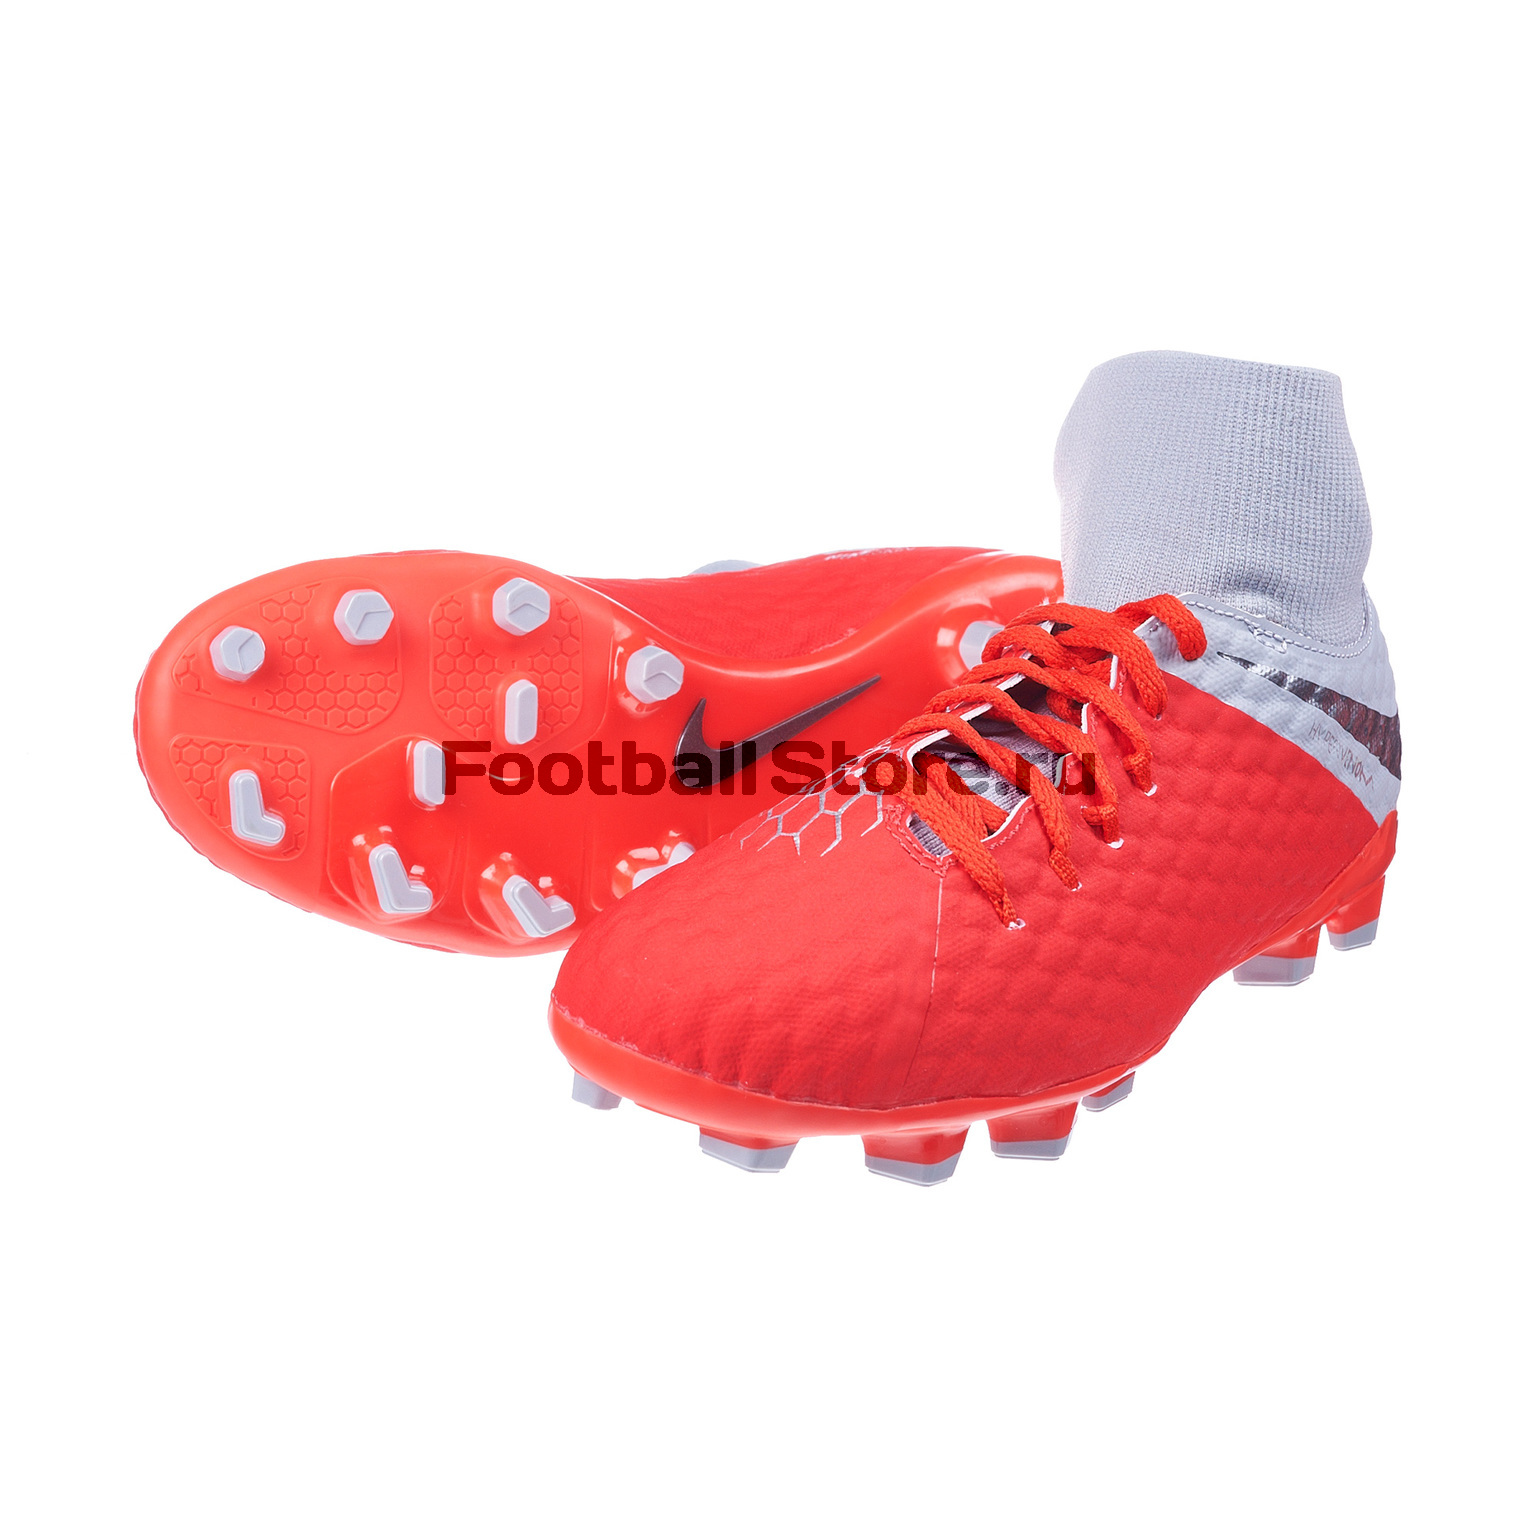 Бутсы детские Nike Hypervenom 3 Academy DF FG AH7287-600 бутсы nike phantom 3 academy df fg ah7268 081